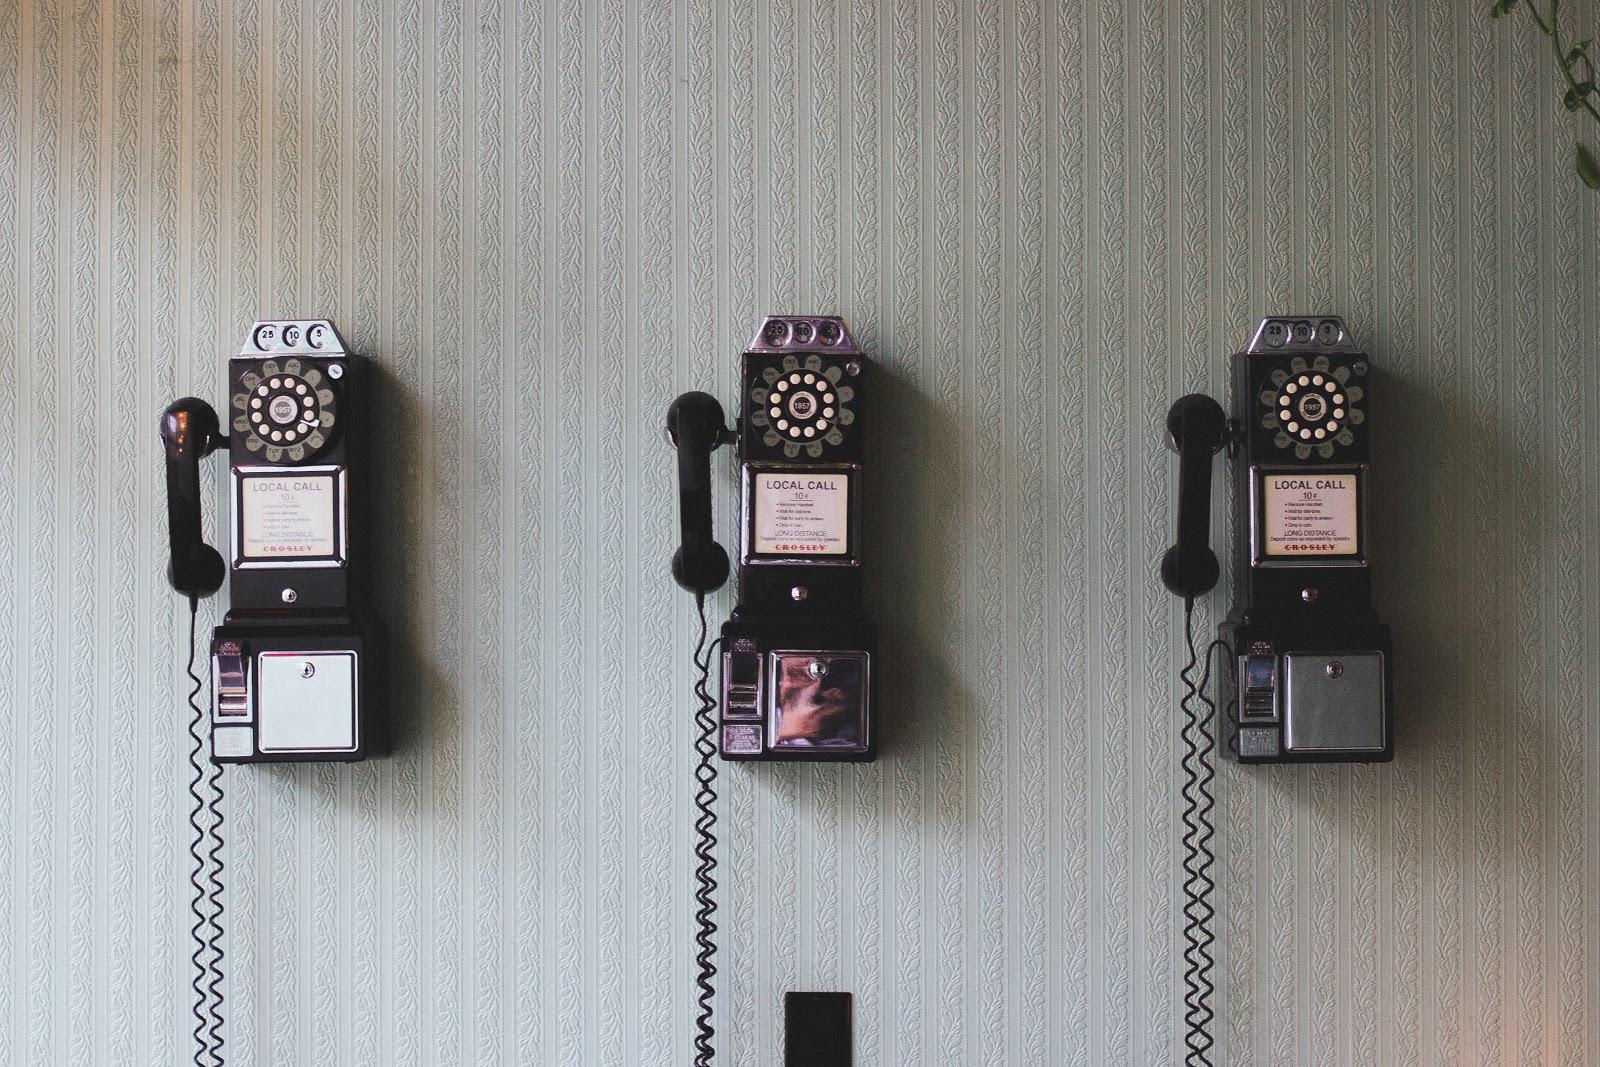 Three wall phones